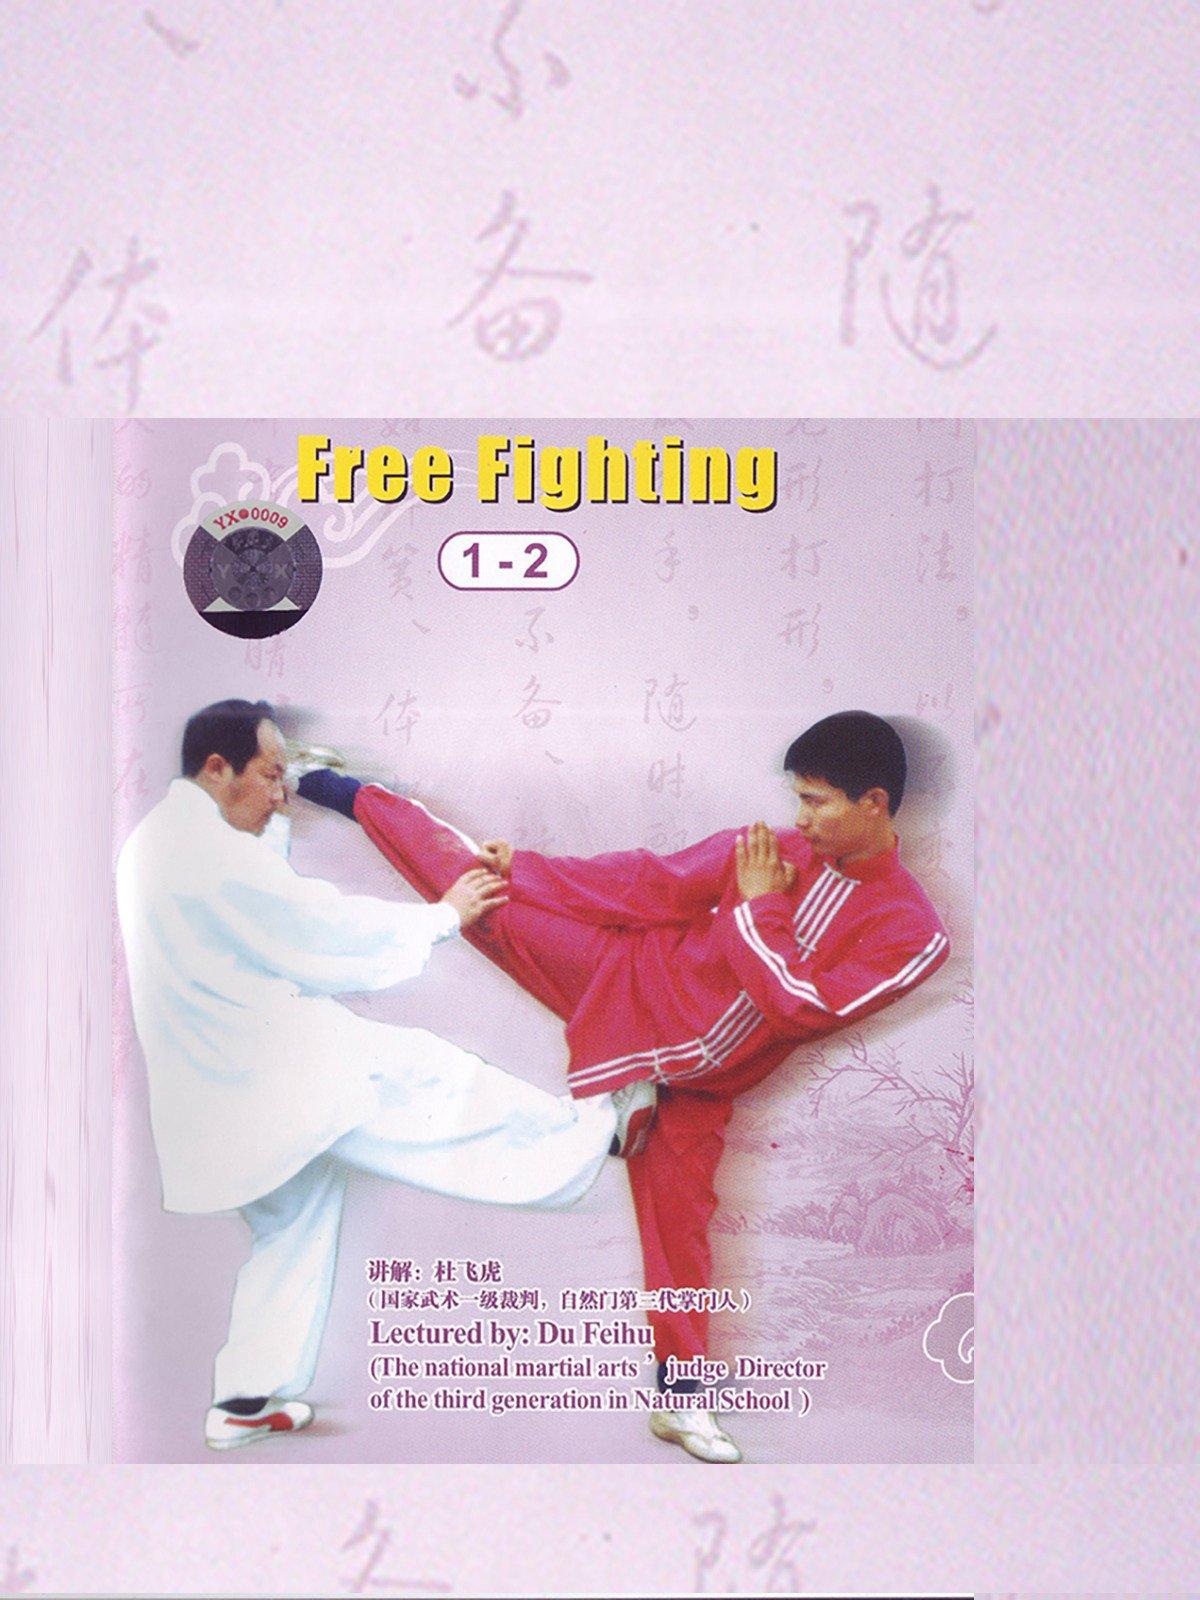 Free Fighting 1-2 on Amazon Prime Video UK